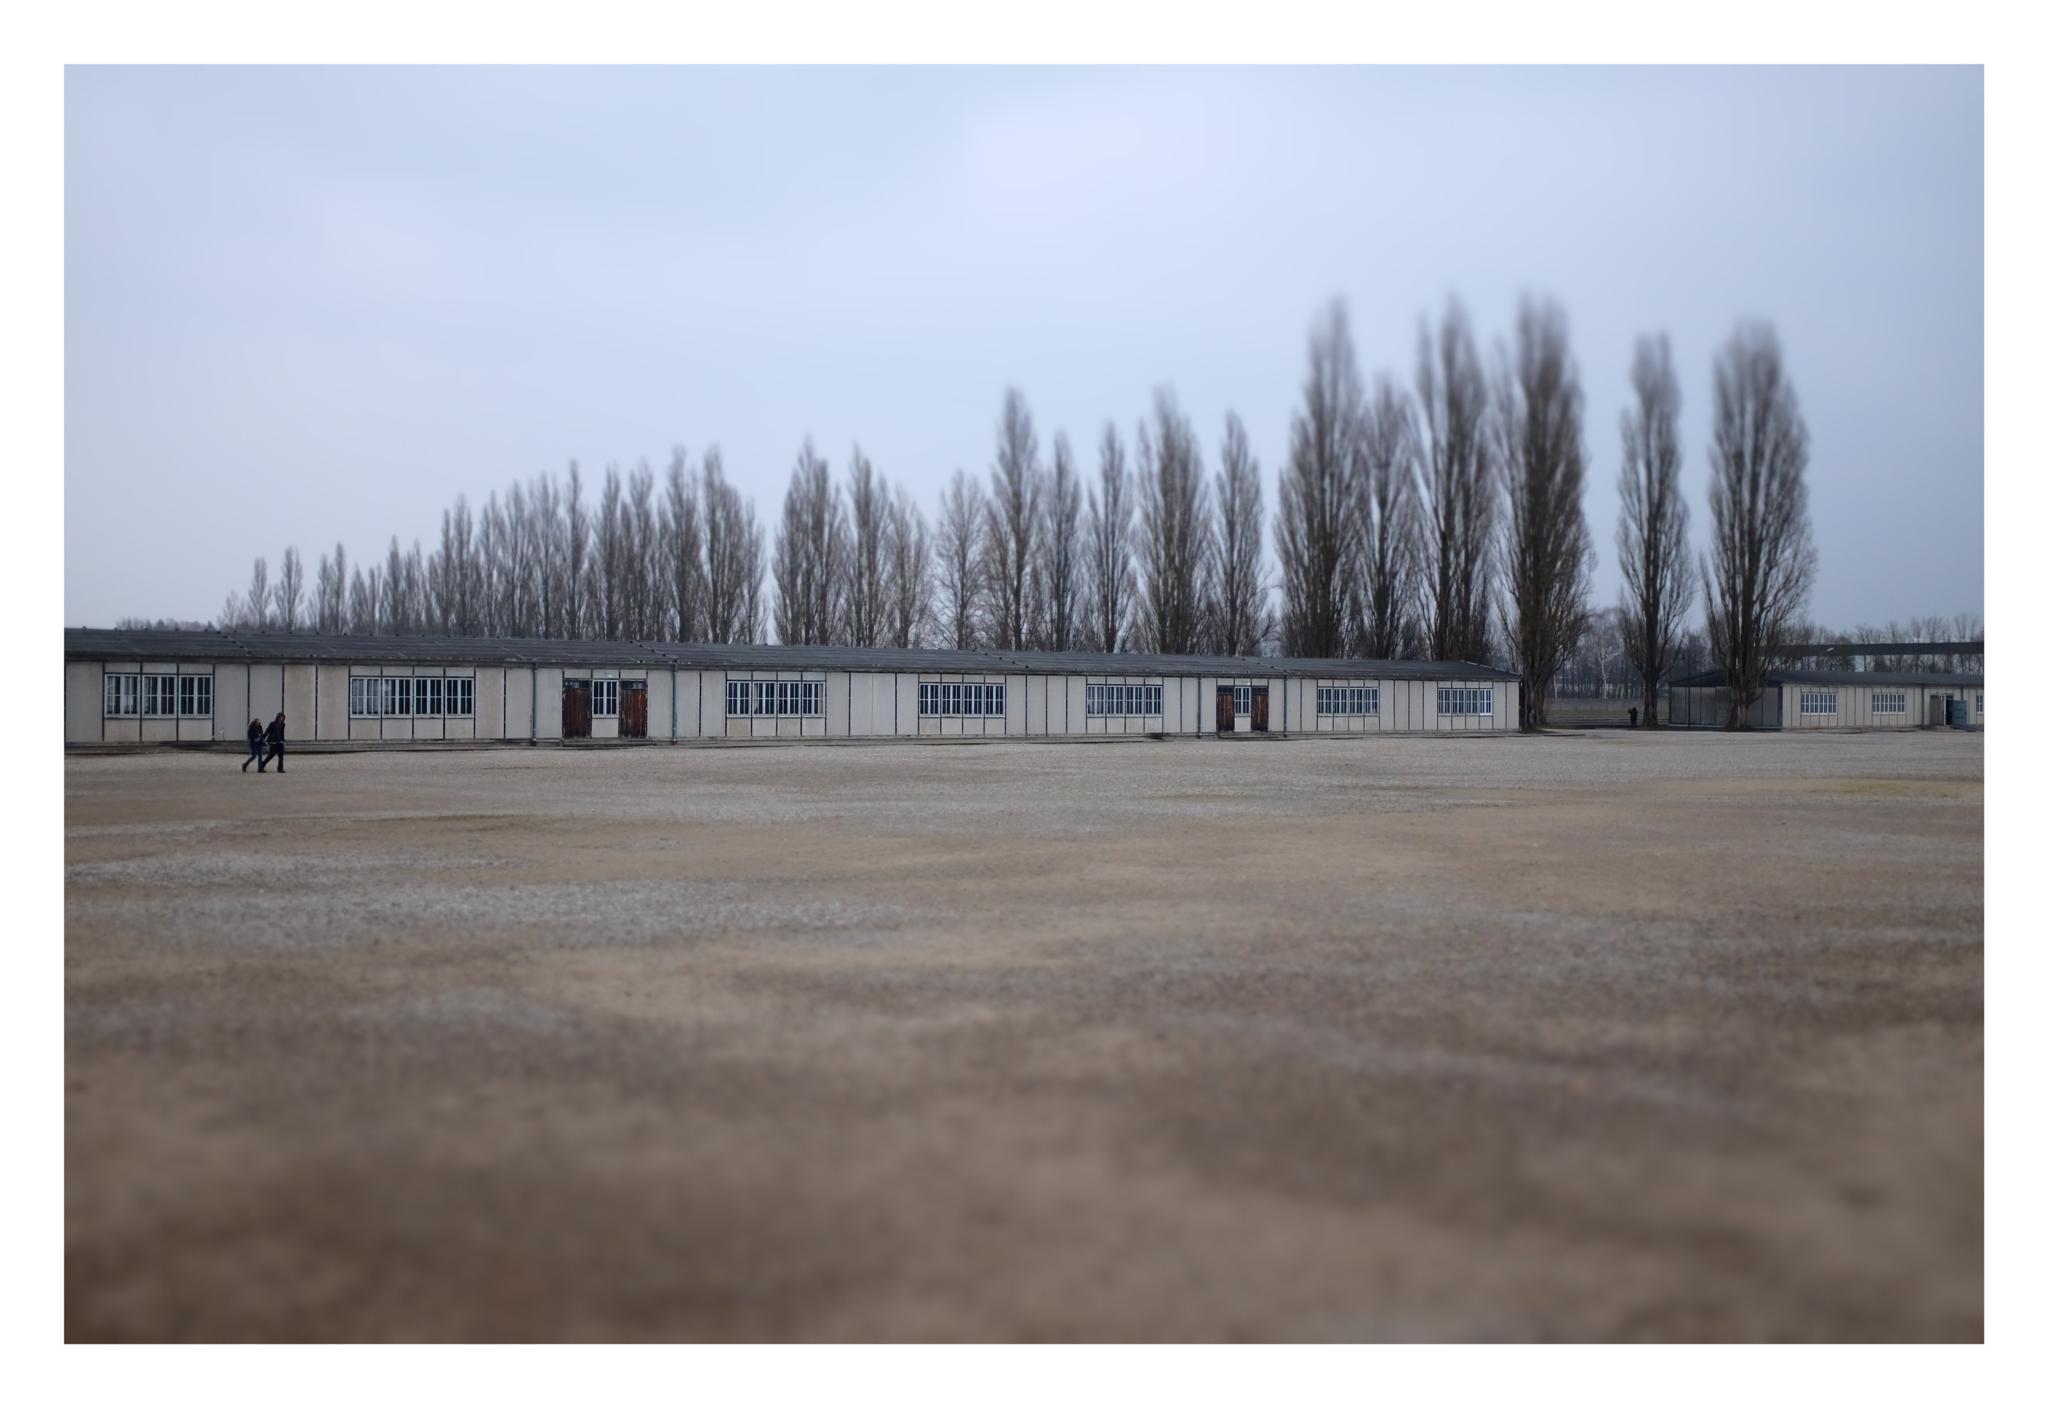 Der Platz by peterkryzun